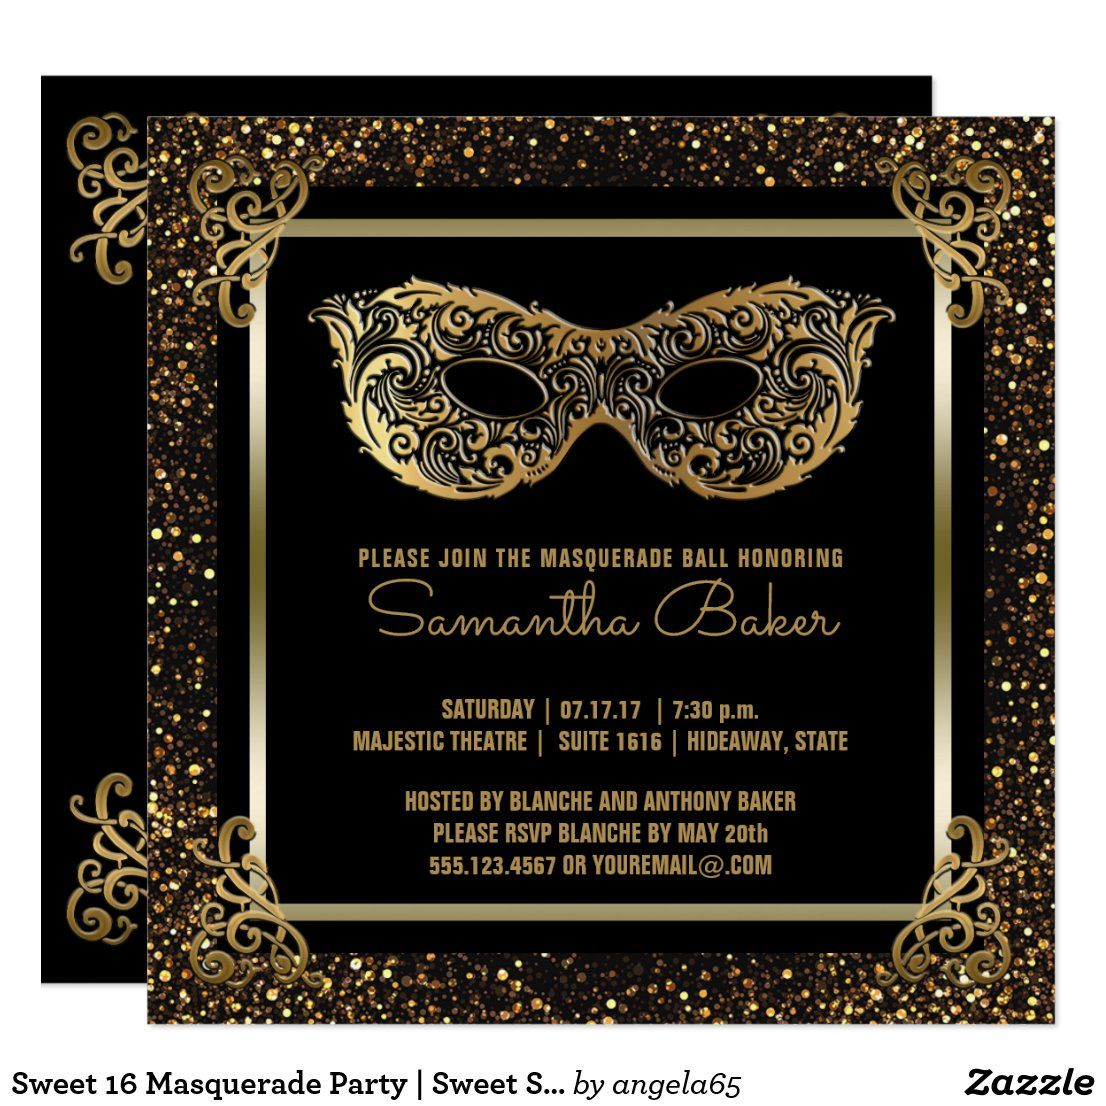 Sweet 16 Masquerade Party | Sweet Sixteen Gold Invitation | Zazzle.com